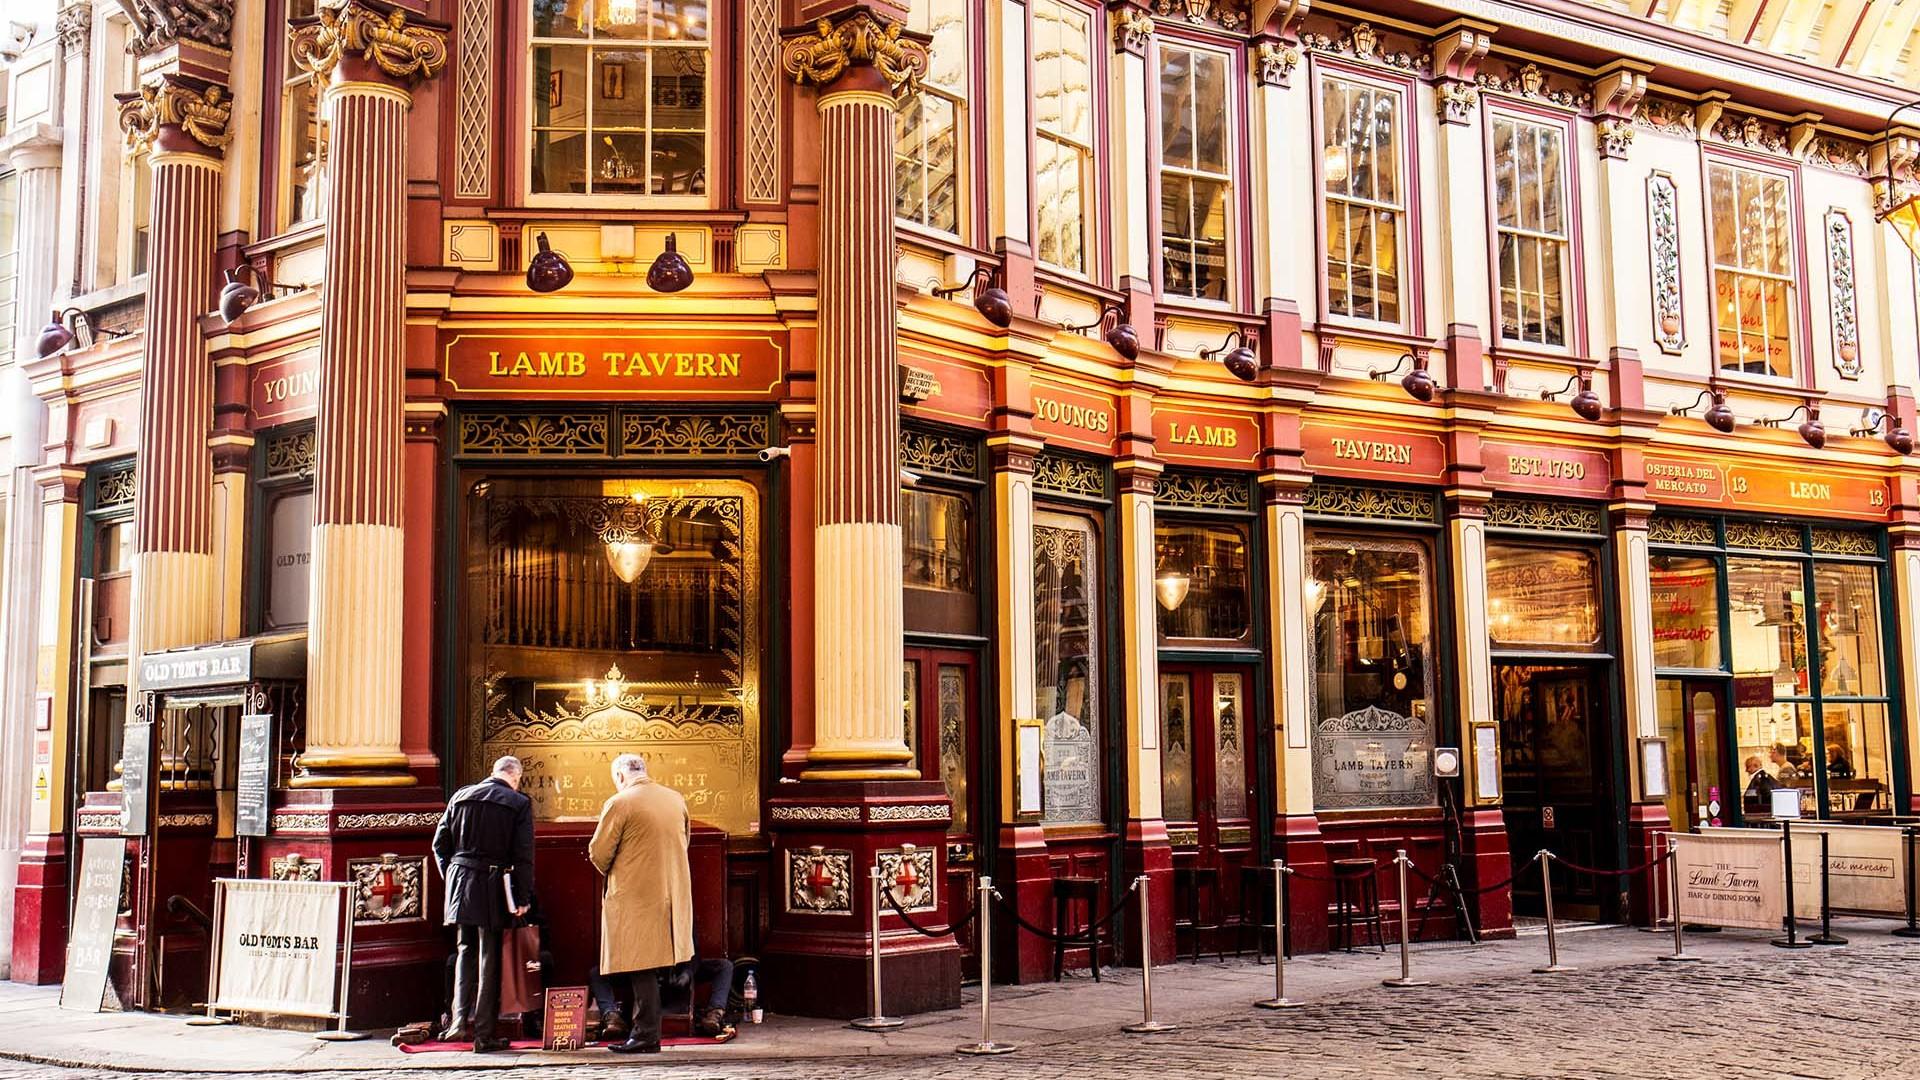 Lamb Tavern